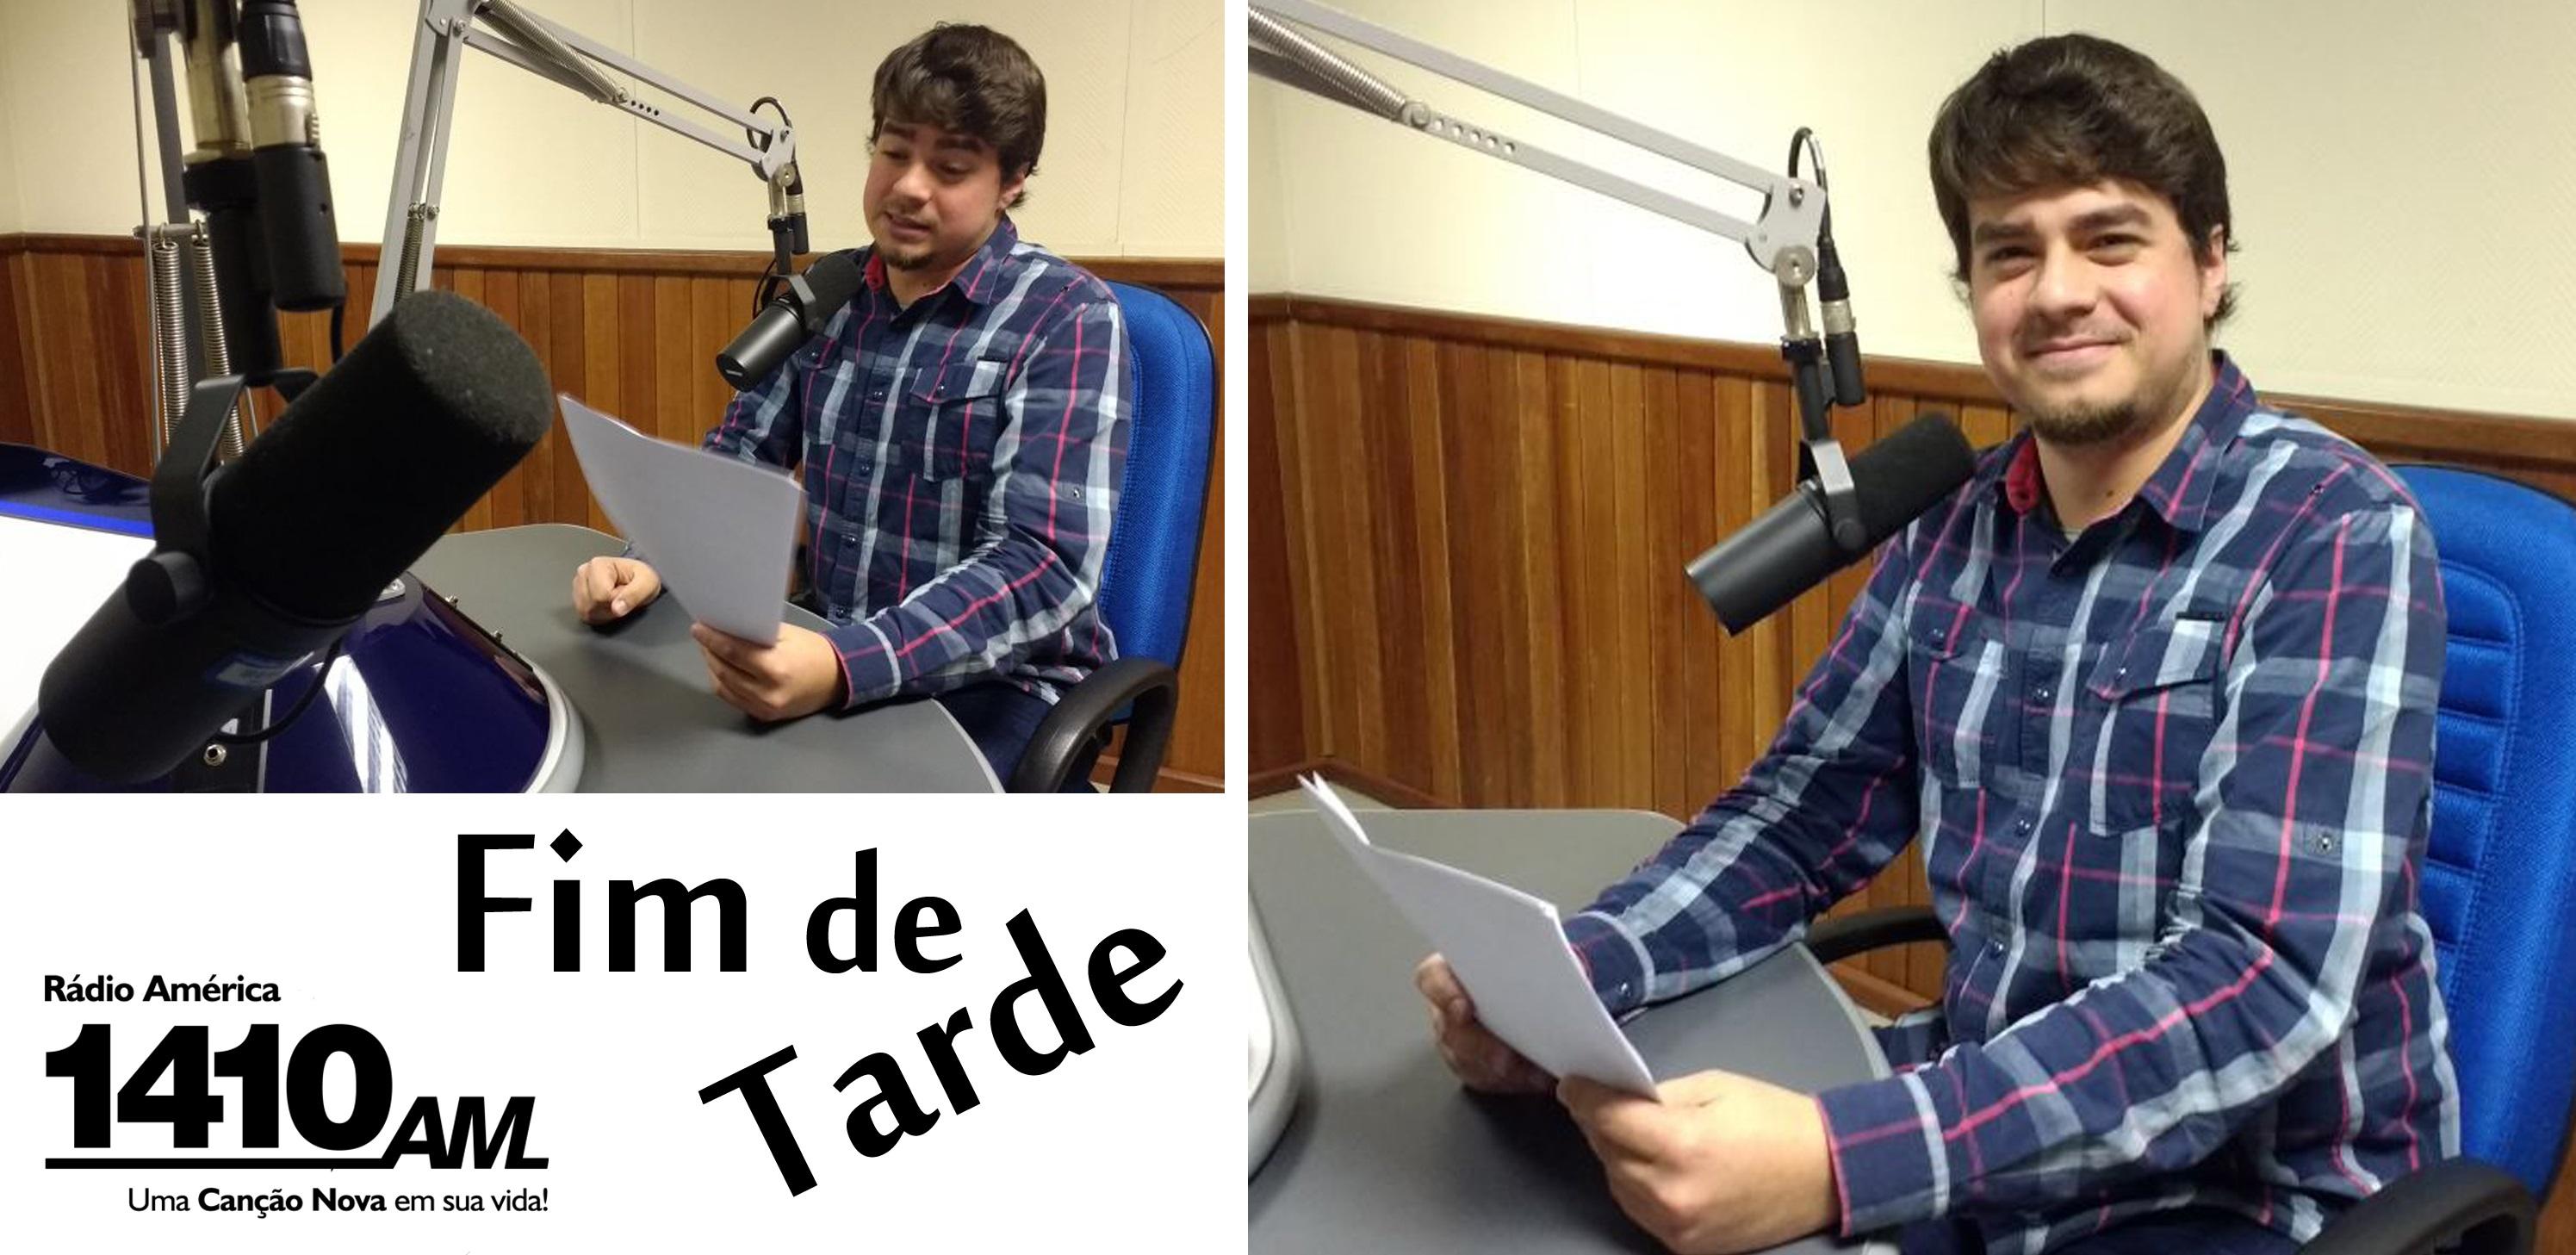 FIM DE TARDE